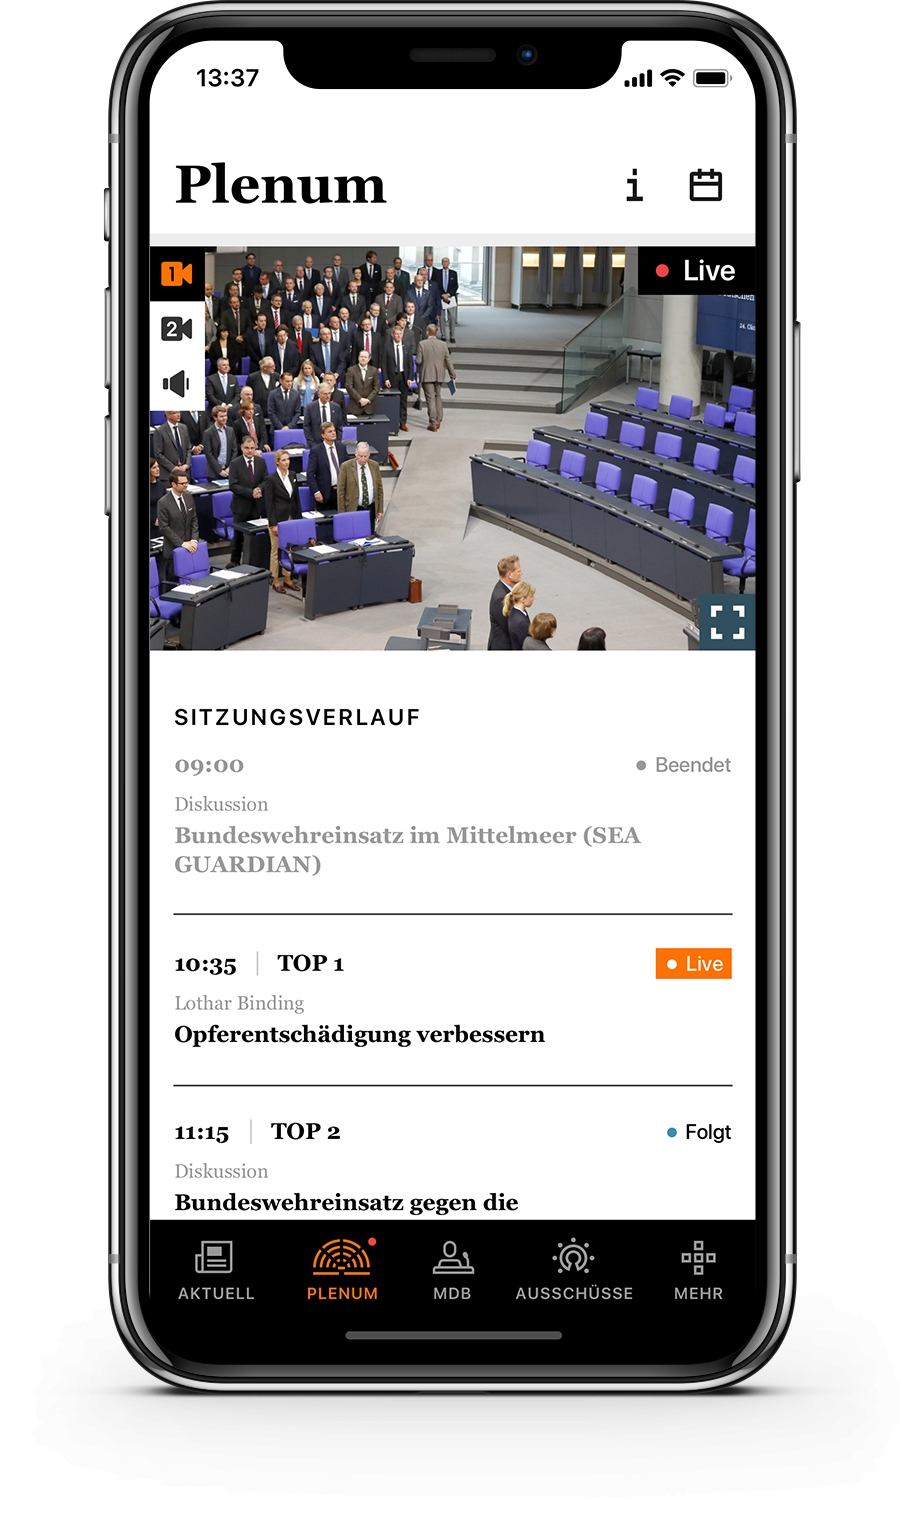 Bundestag lässt bei den Tschechen neue App programmieren